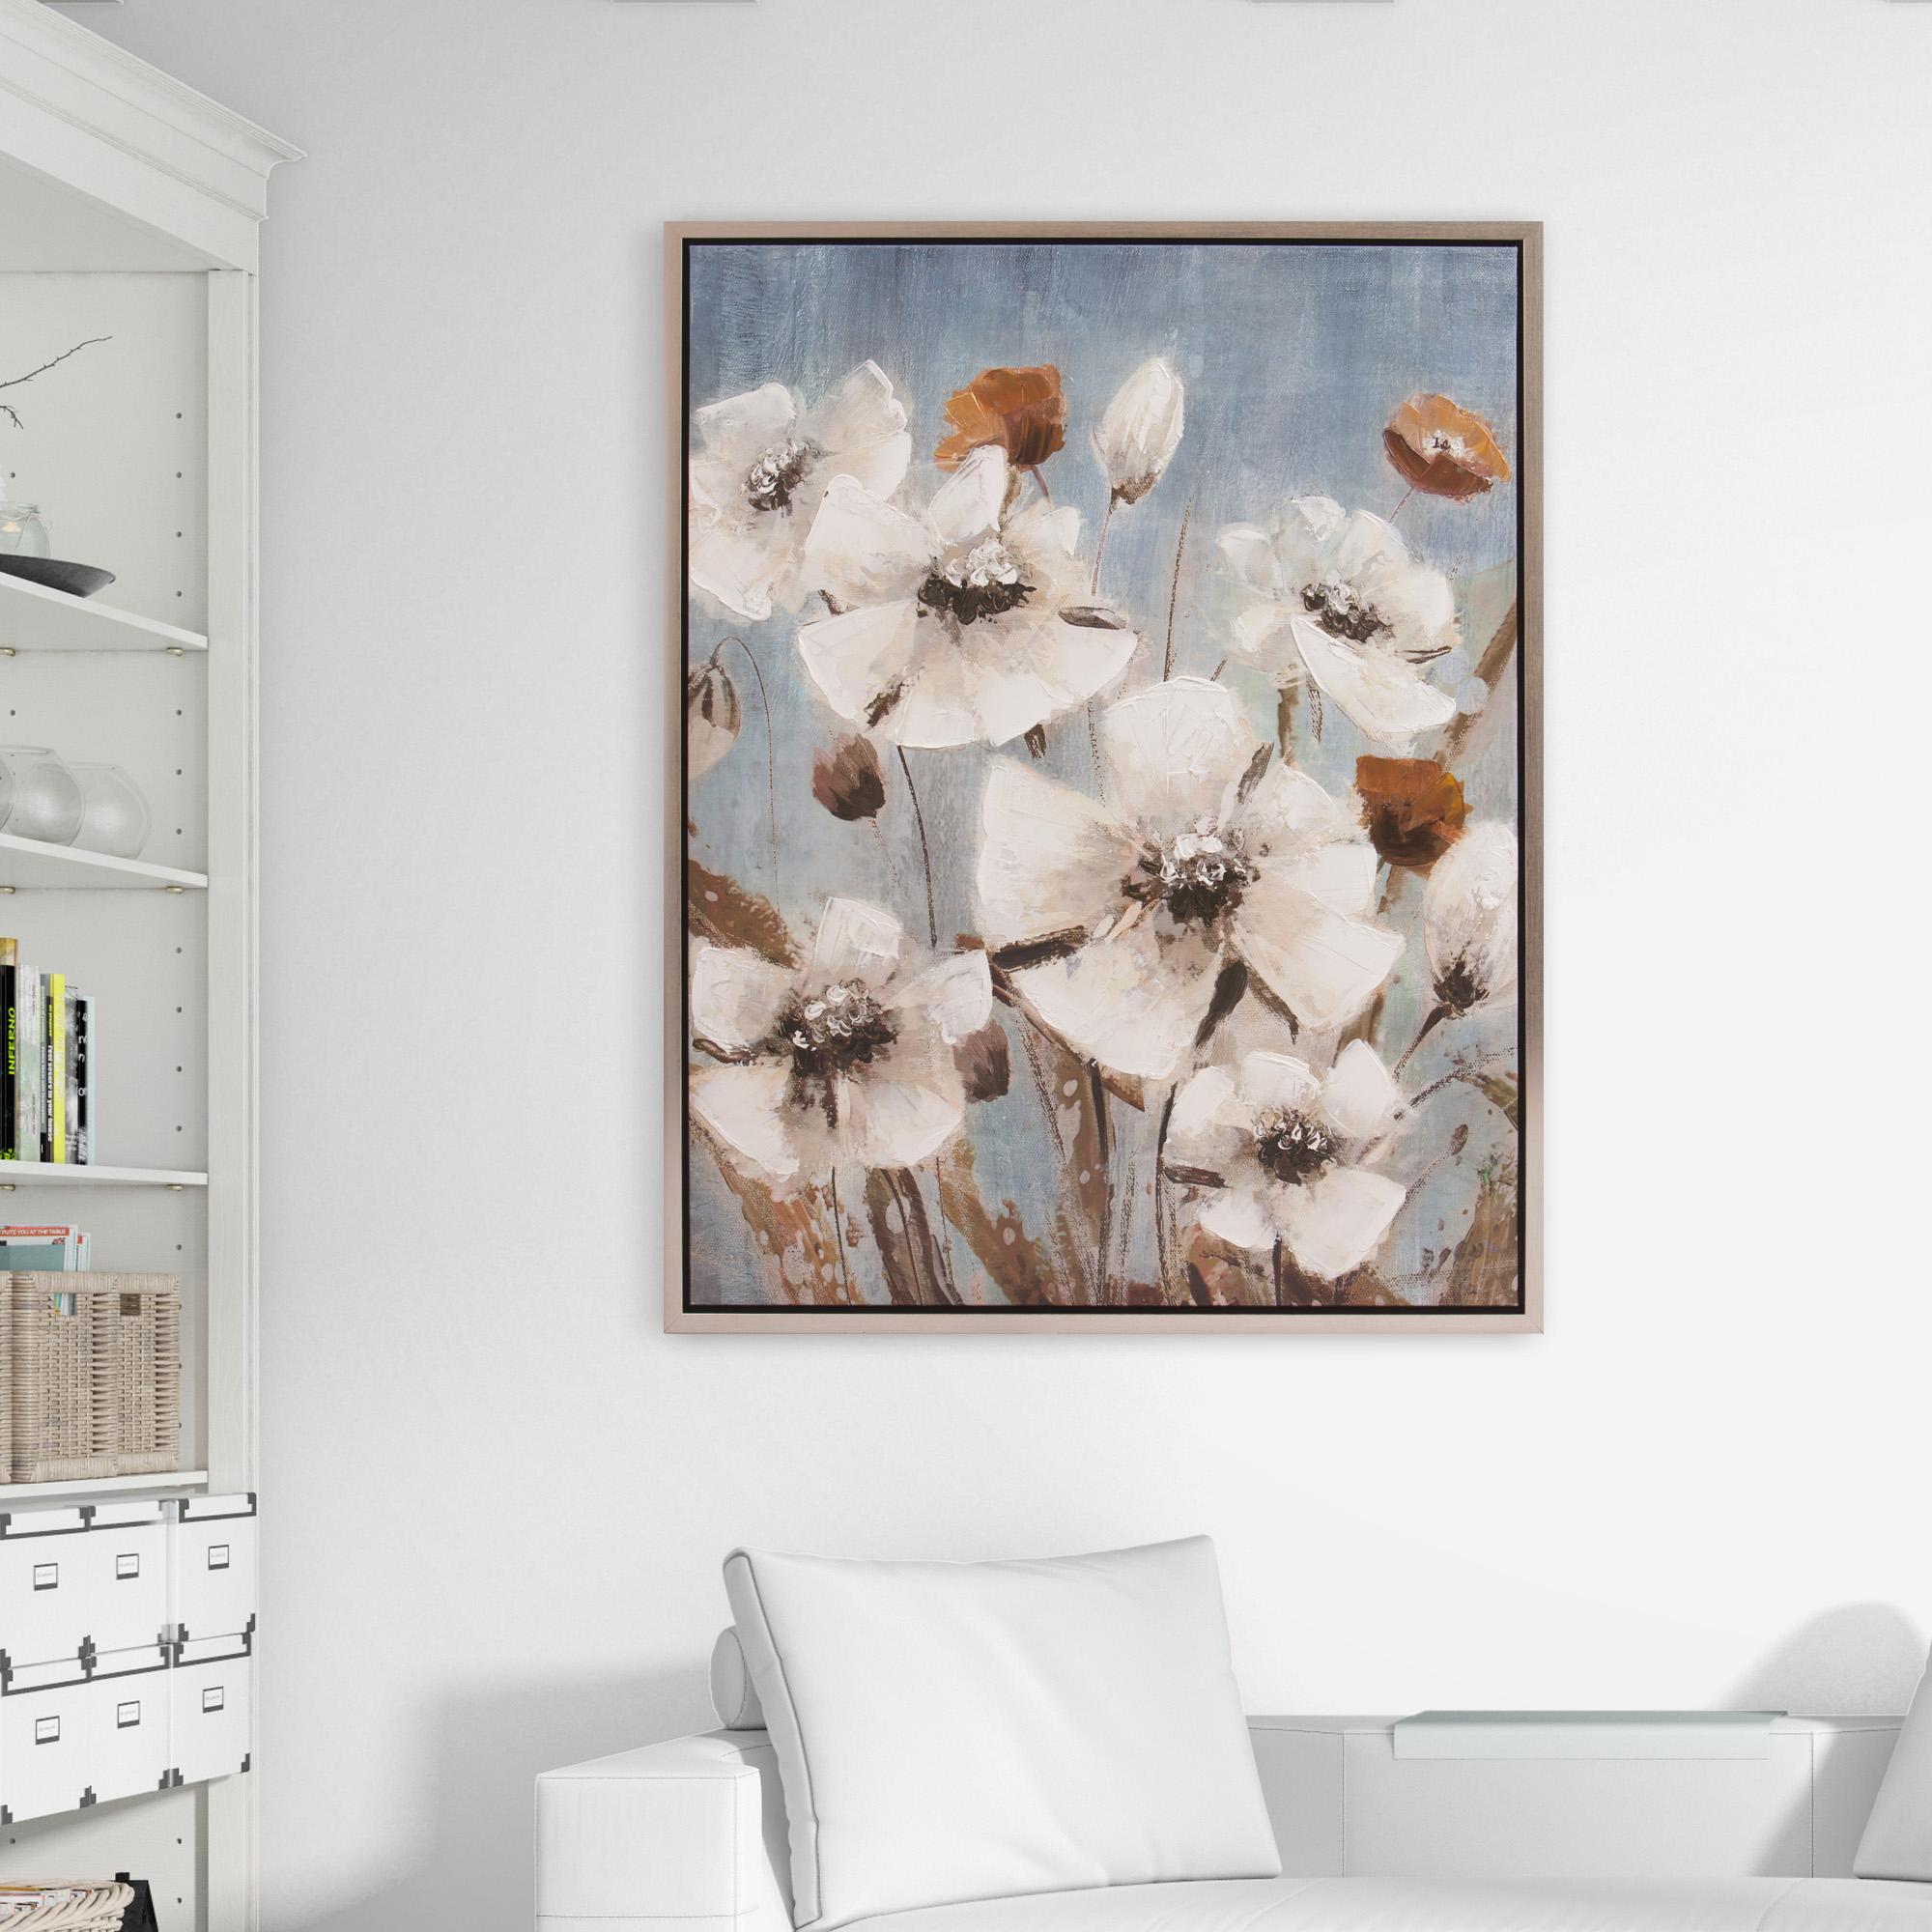 Patton Wall Decor White Poppy Field Floral 30 x 38 Framed Canvas Art Silver